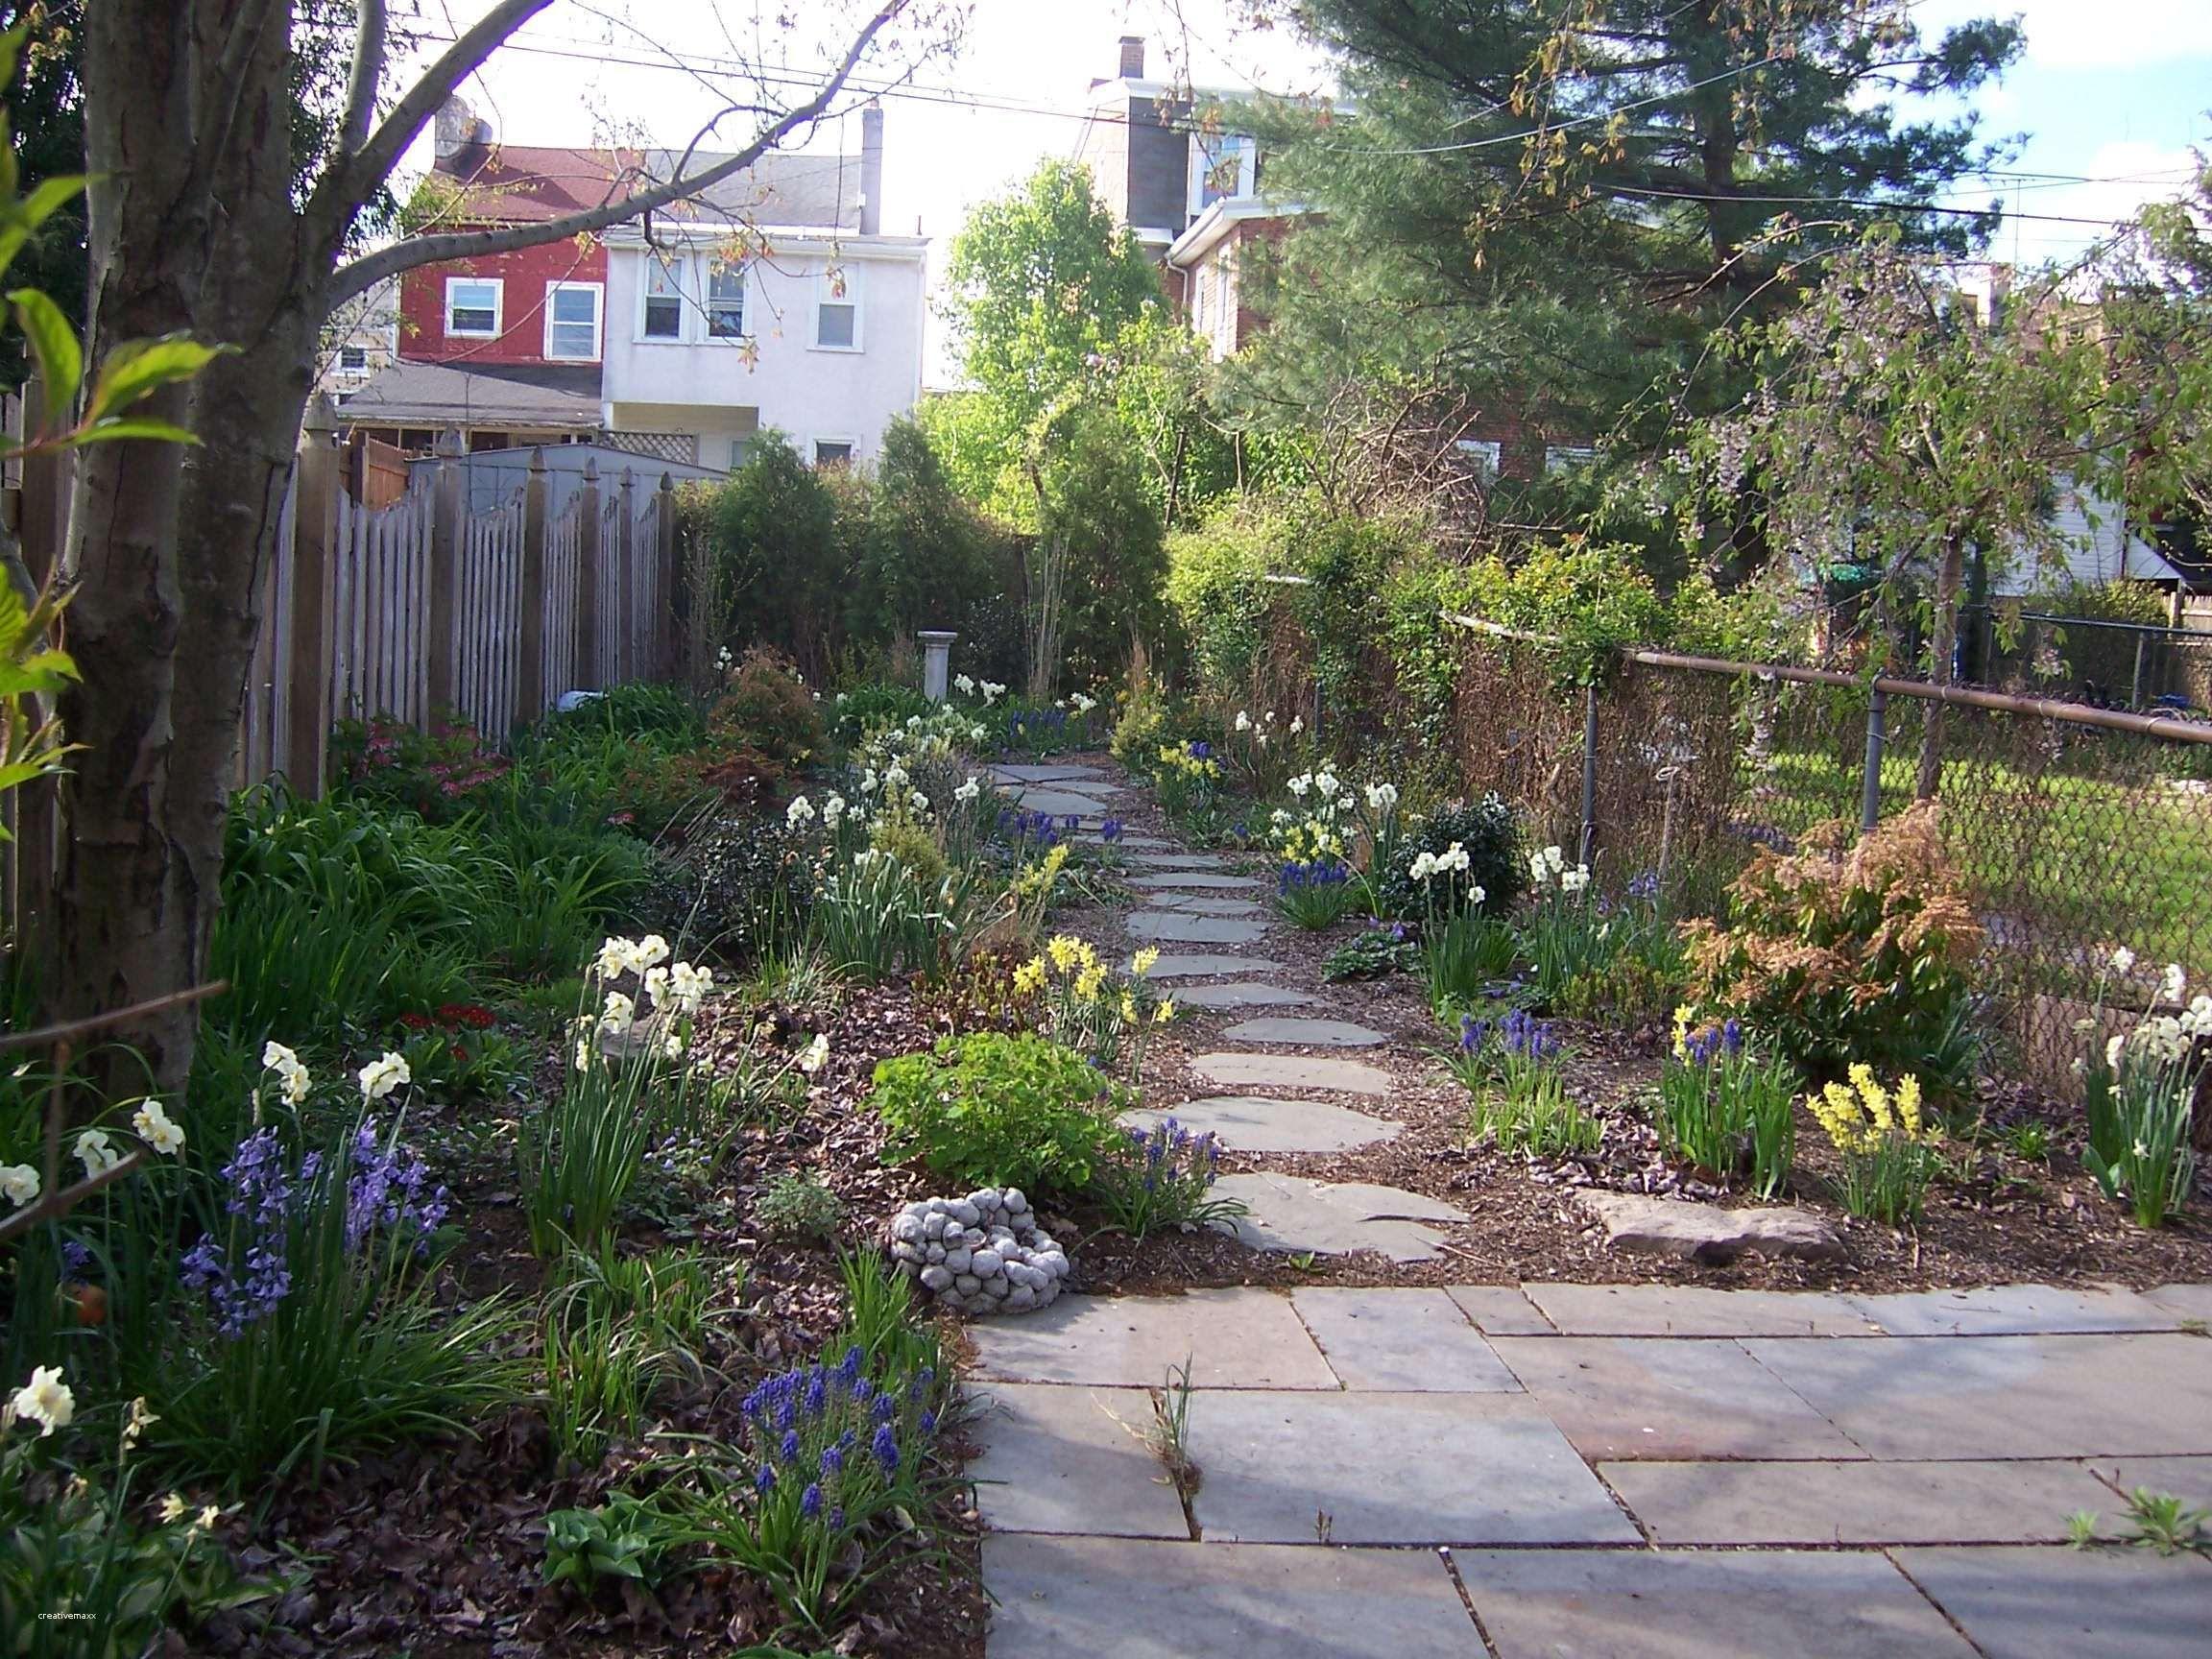 Medium Of Backyard Design Without Grass